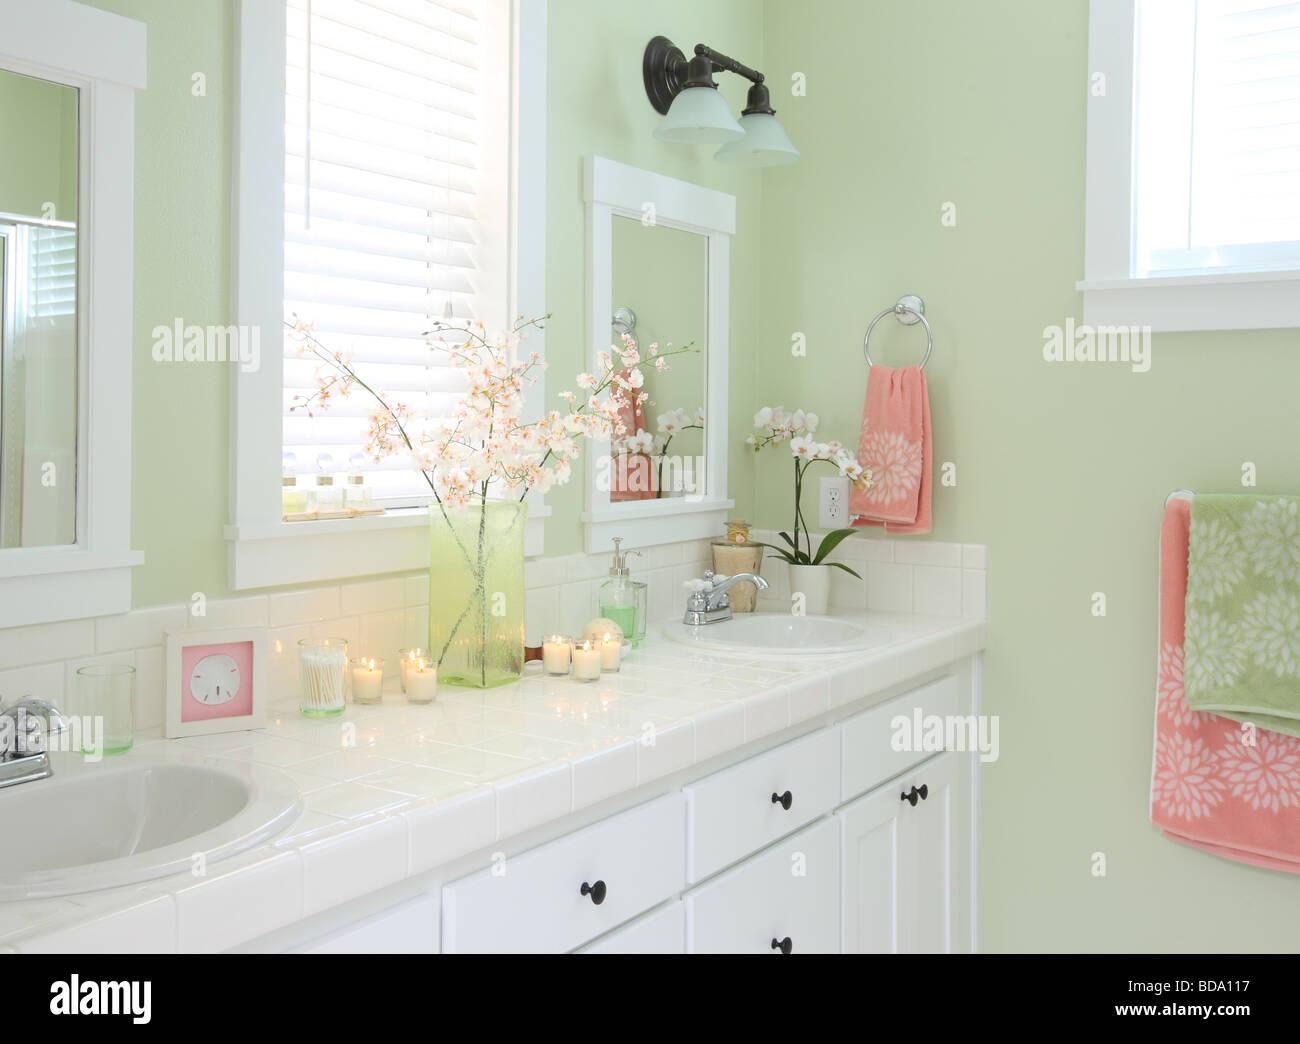 Bathroom interior - Stock Image